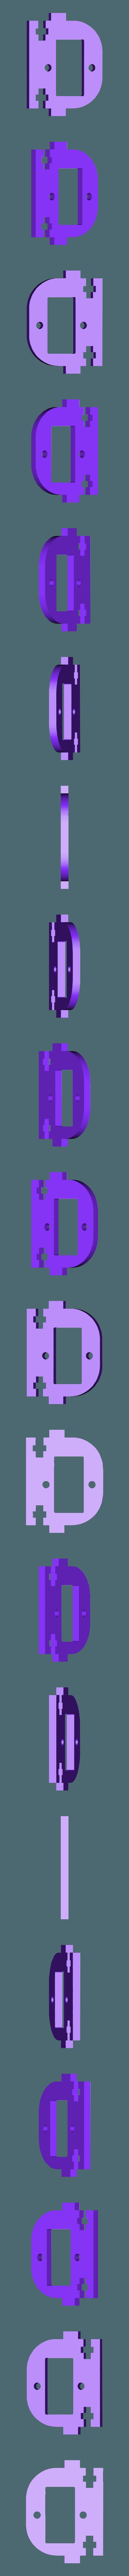 Leg_Servo_Mount.stl Download free STL file mePed Quadruped Robot • 3D printing template, MinorSymphony